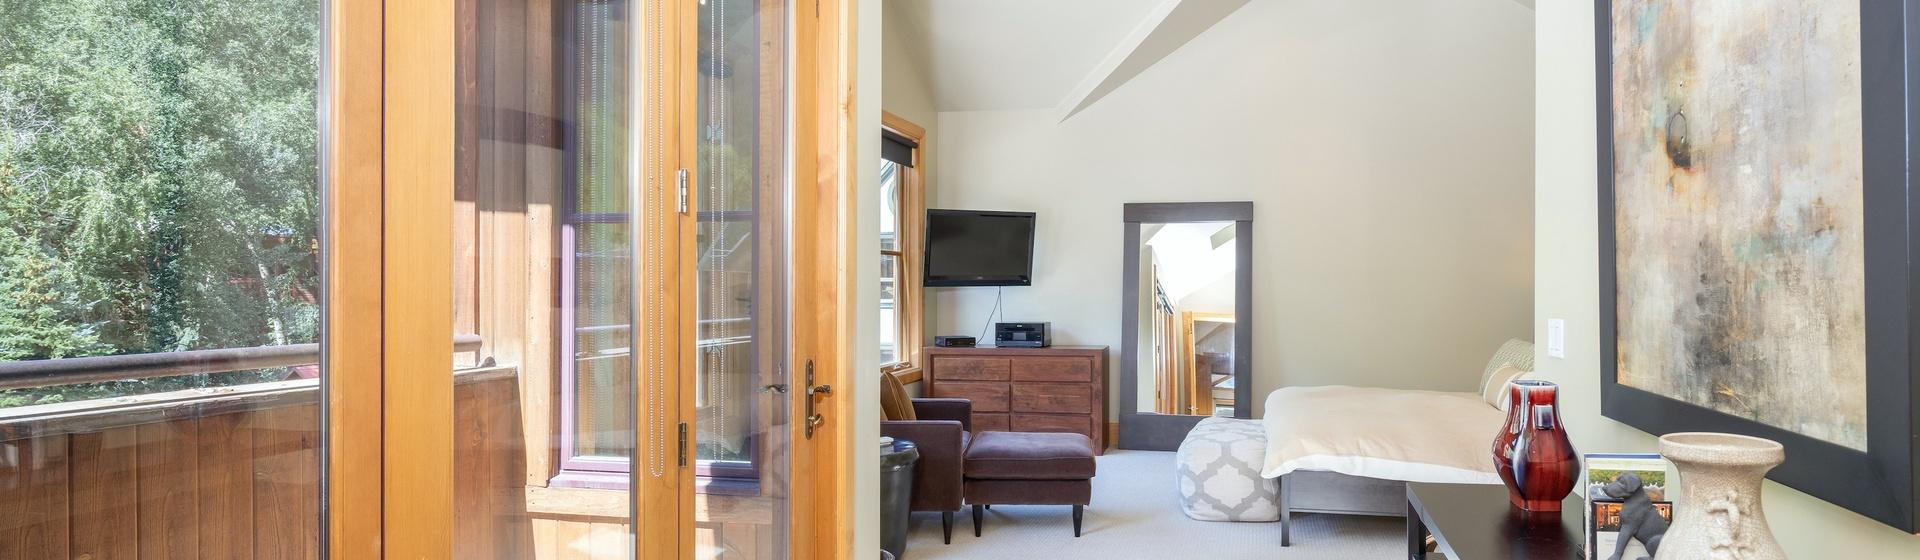 9.2-Telluride-Pine-Street-Penthouse-Secondary-Suite